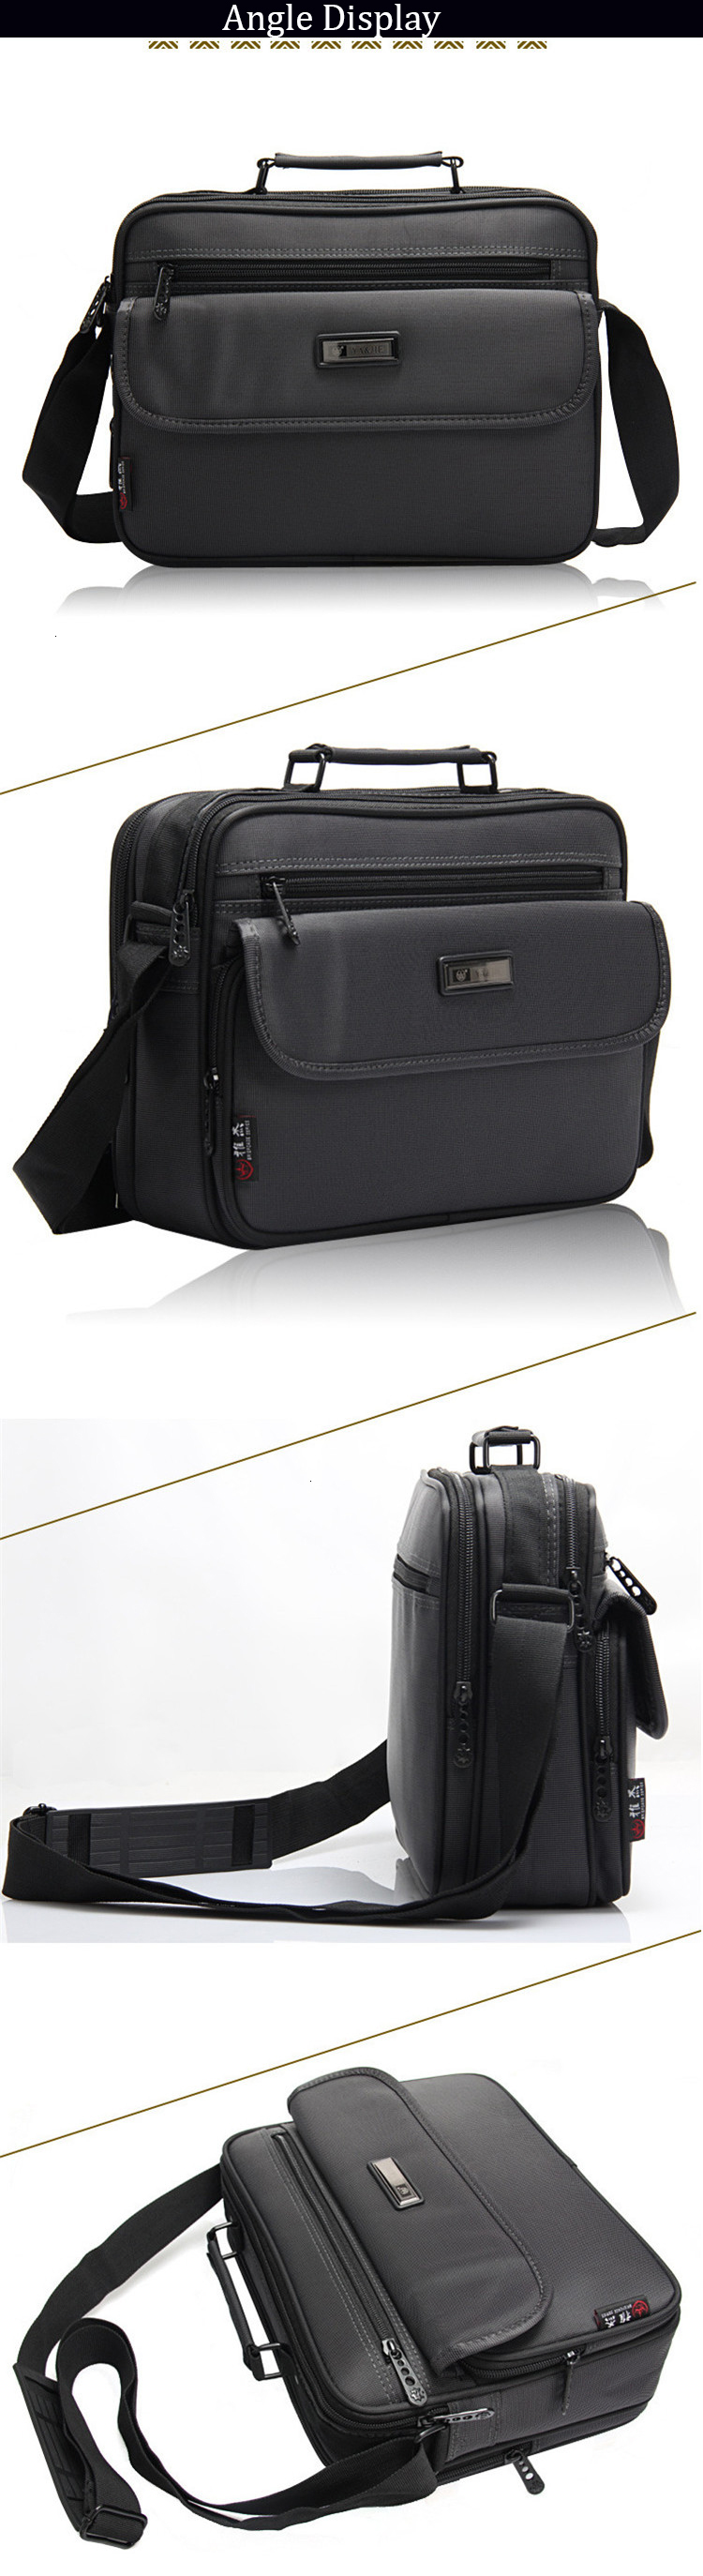 Hb61b436e610d450eb3183b1b5db6f26aY 2019 New Briefcases Of Sizes Men's Laptop Bag Top Quality Waterproof Men bags Business Package Shoulder Bag masculina briefcase